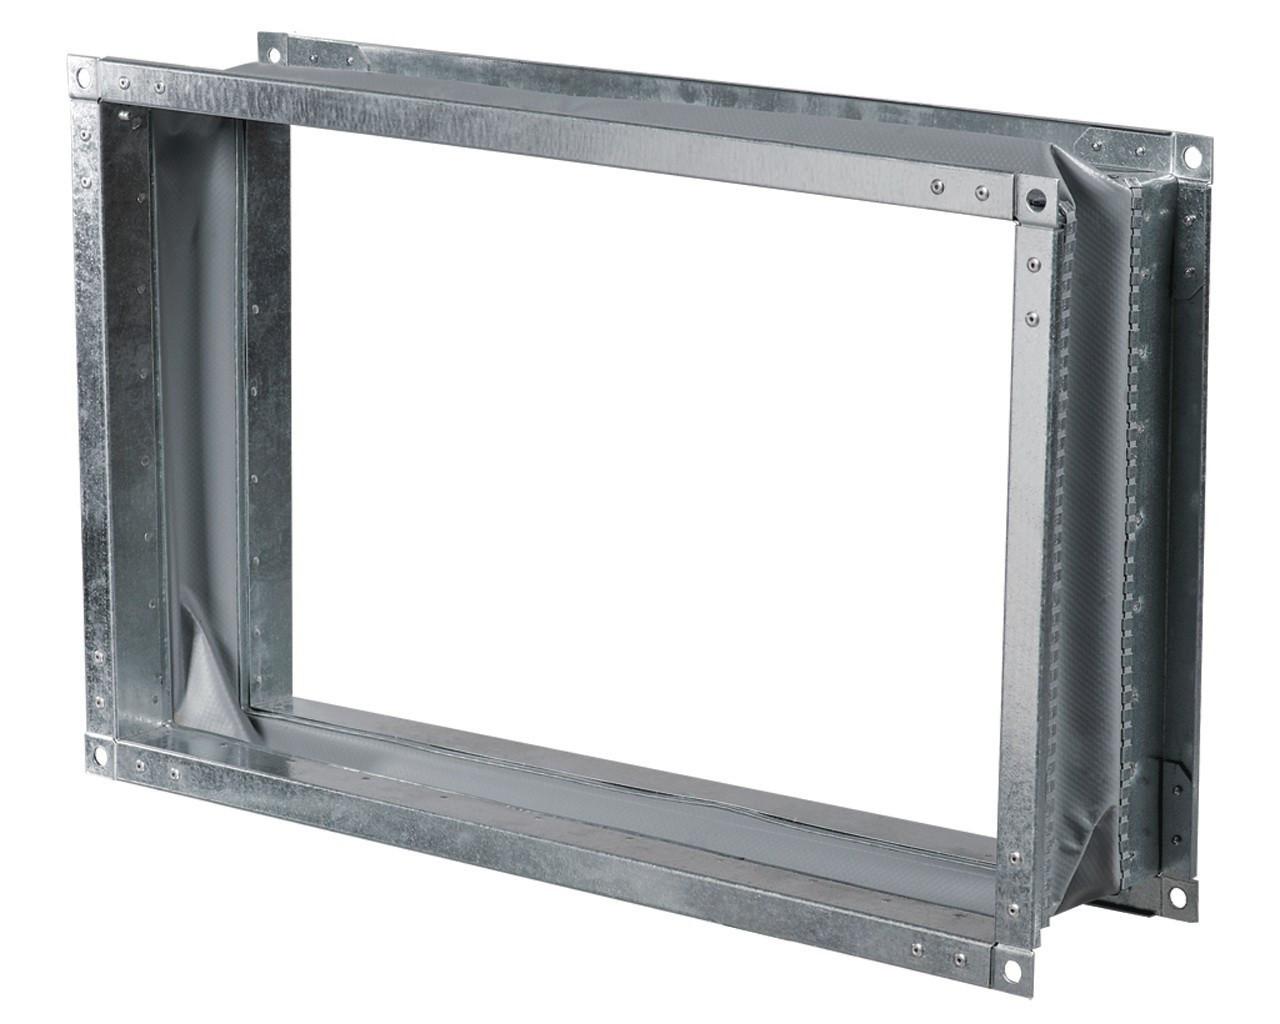 Гибкая вставка для вентиляции Вентс ВВГ 400х200